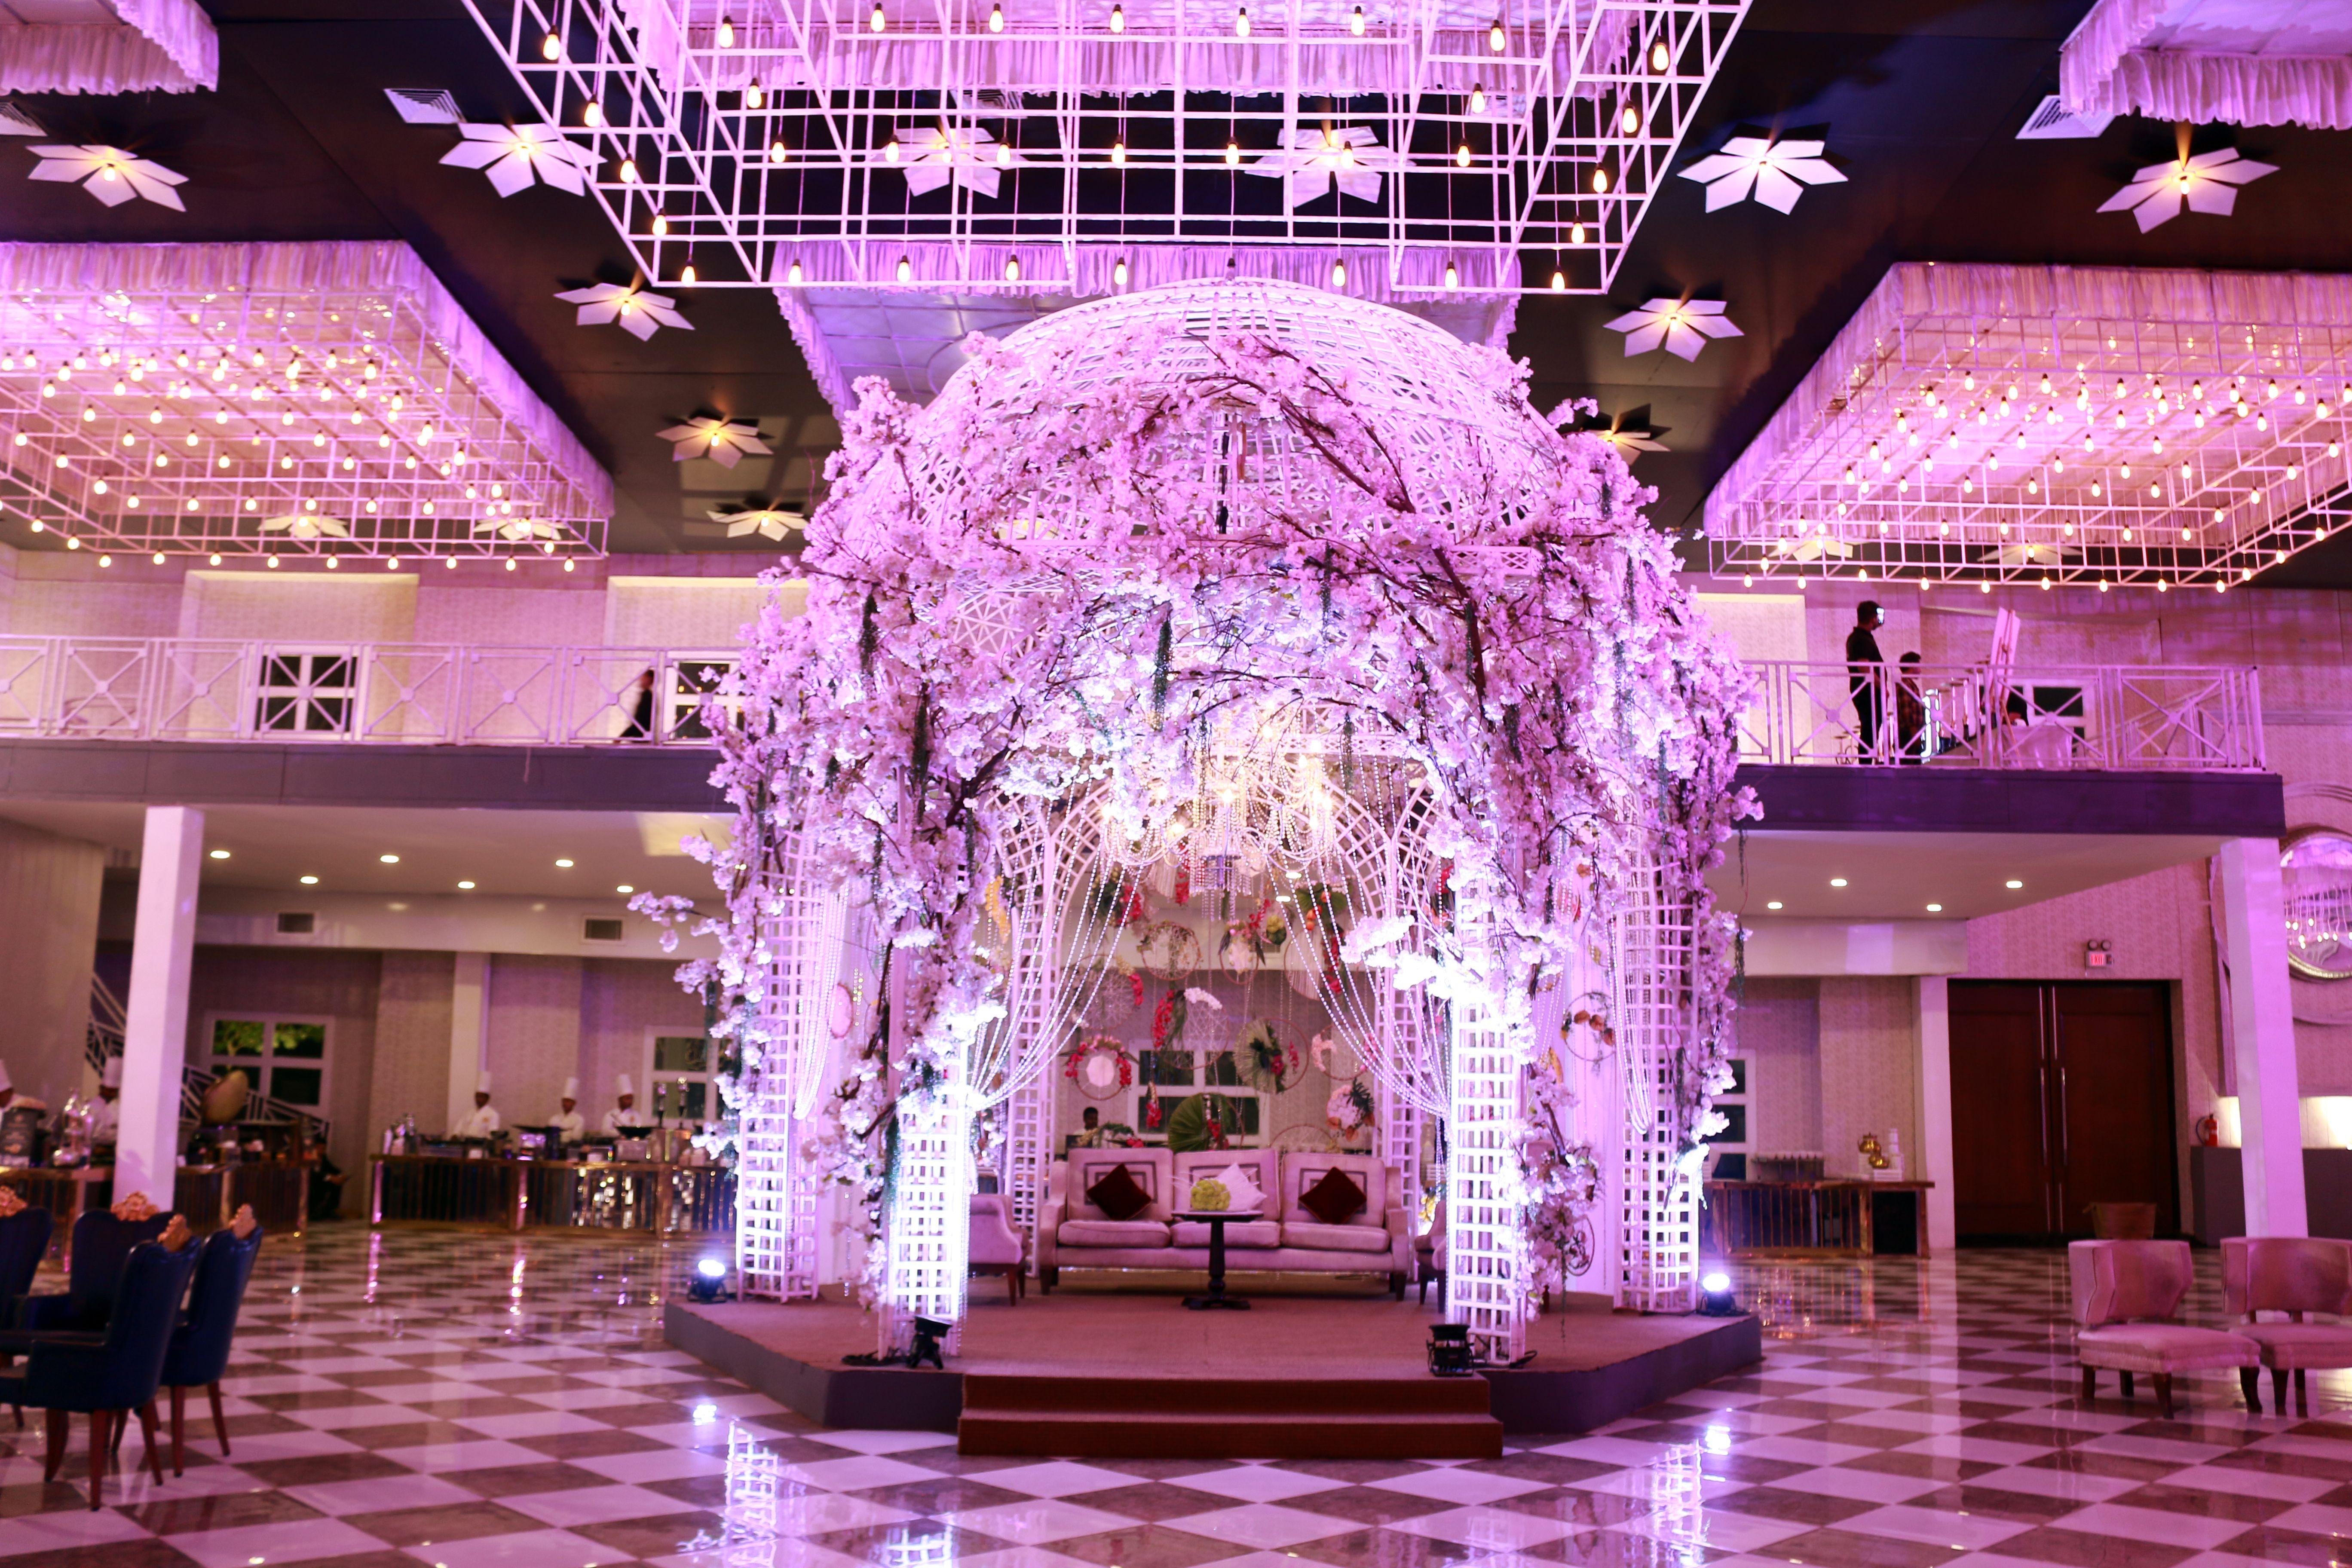 Best Banquet Halls In Delhi For Marriage In 2020 Wedding Banquet Hall Luxury Wedding Venues Wedding Hall